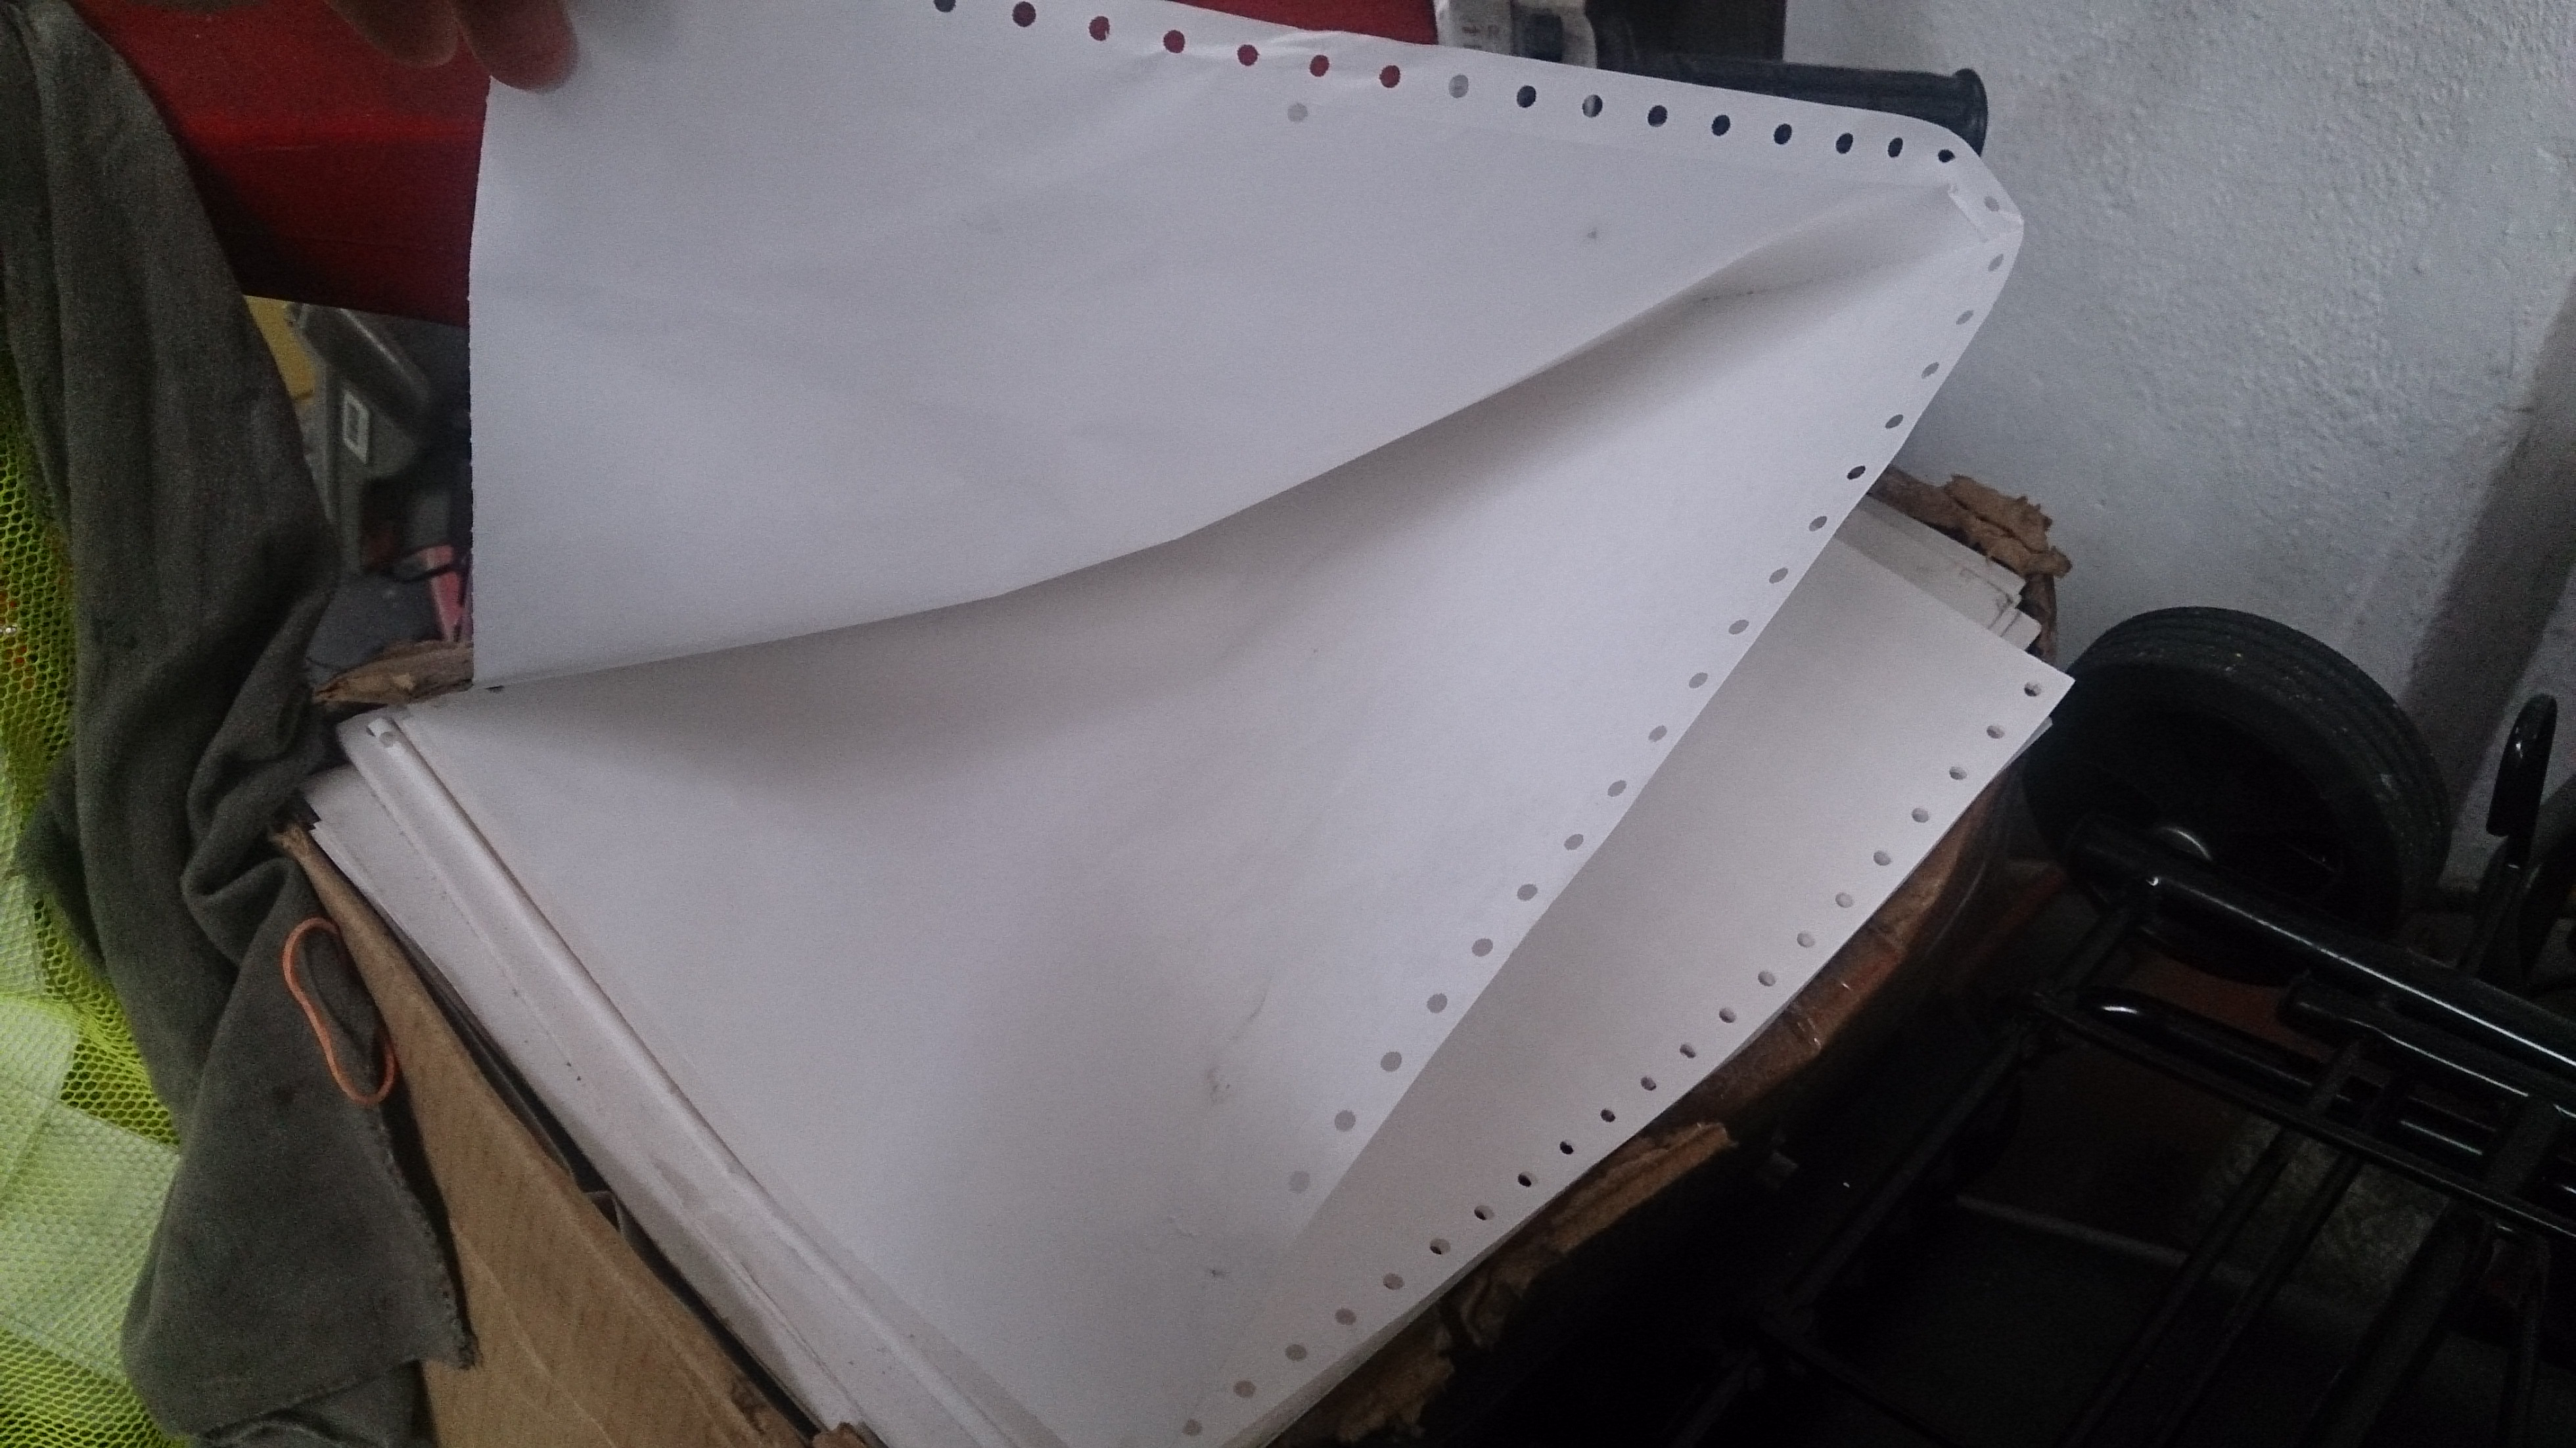 File:Paper for dot matrix printers.jpg - Wikimedia Commons